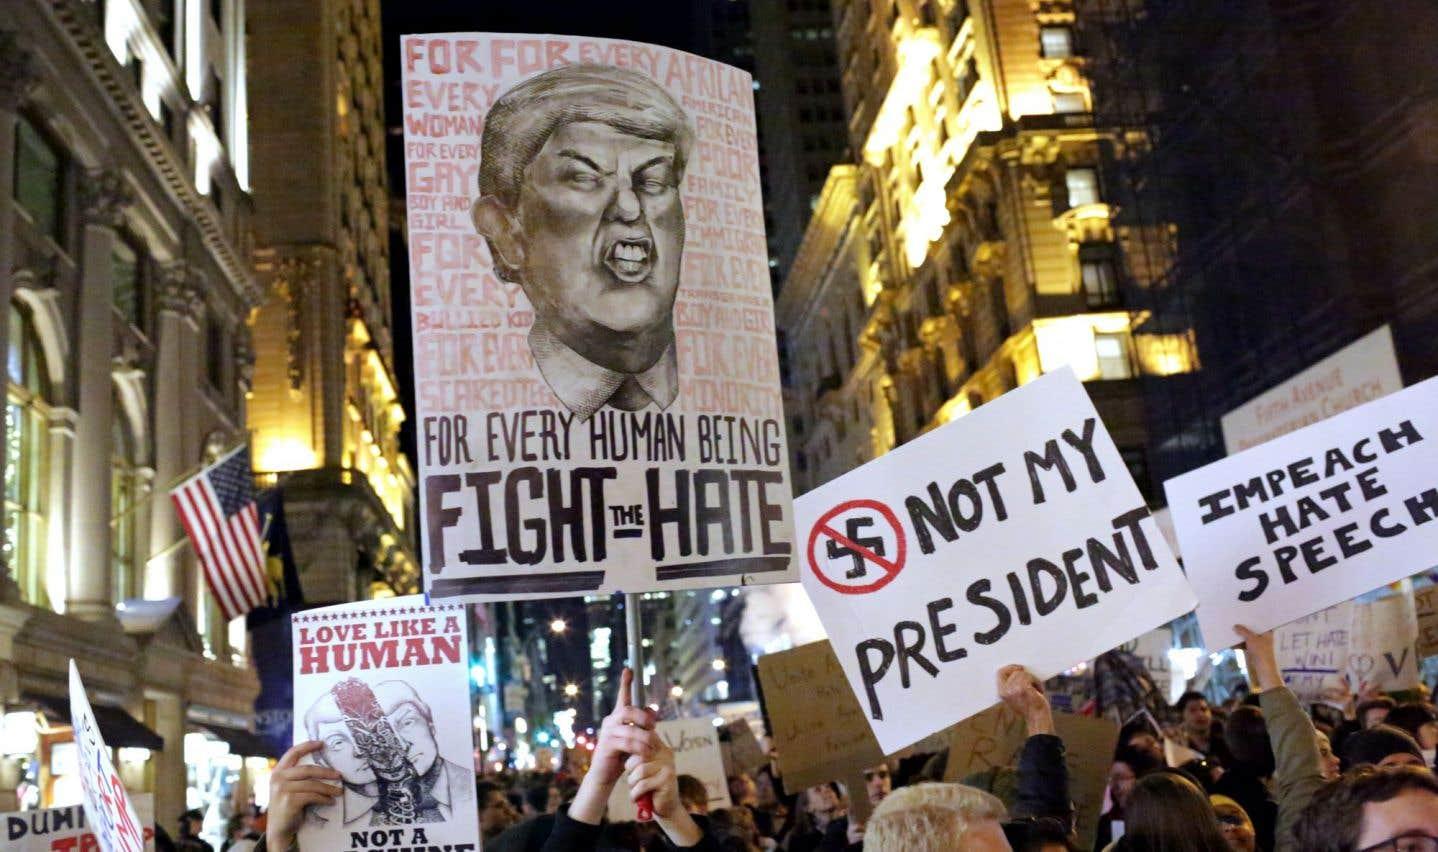 Manifestation anti-Trump, le 12 novembre dernier, à New York